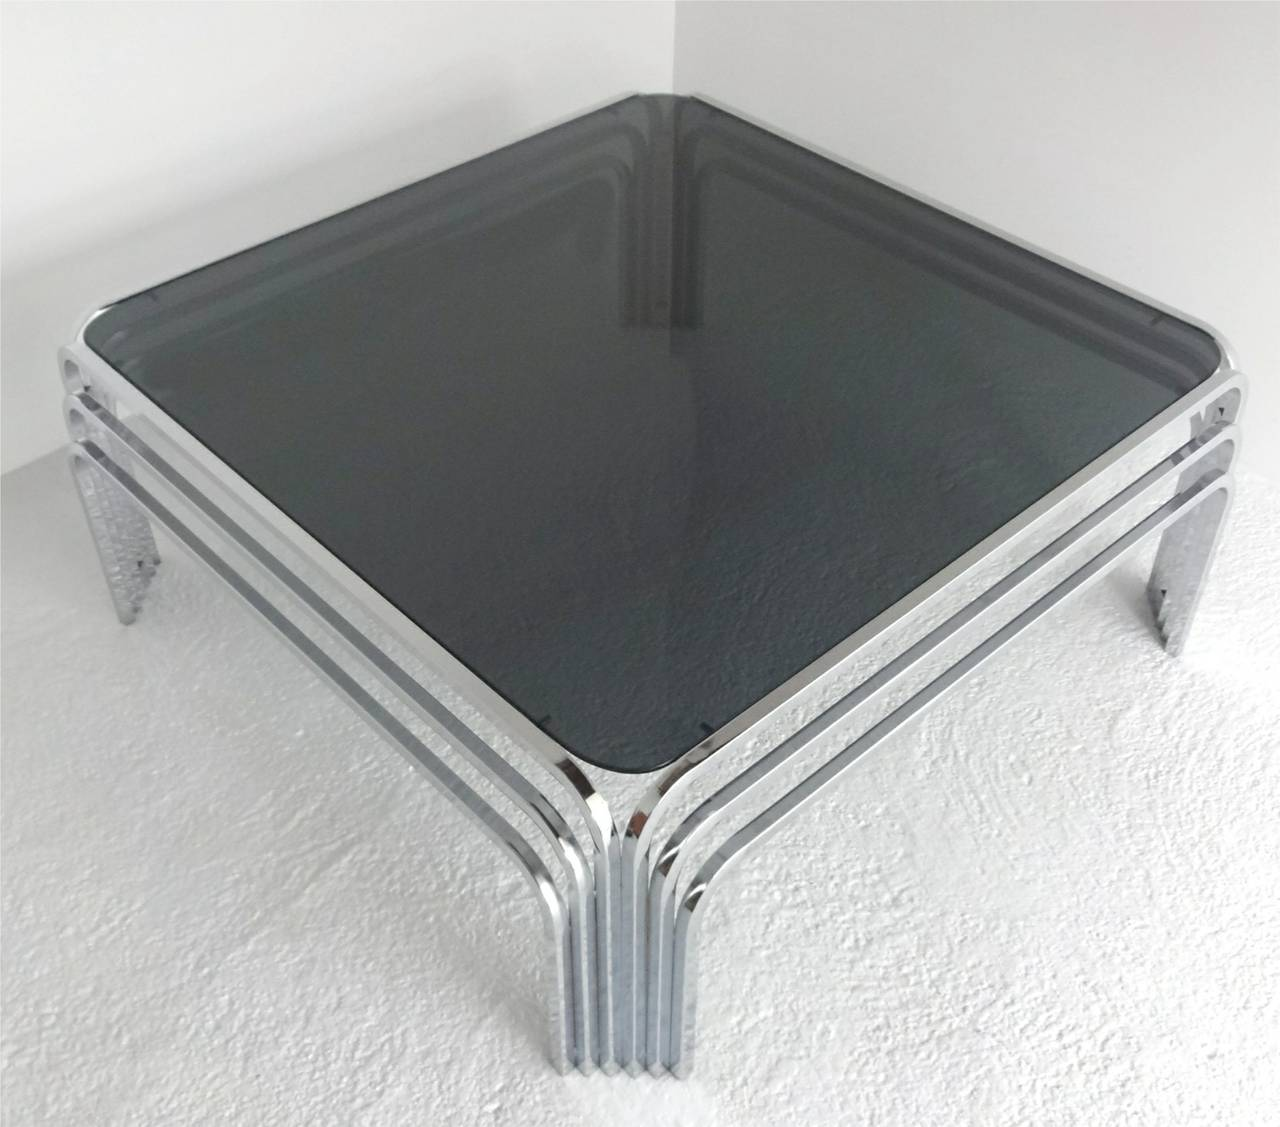 Deco Chrome Coffee Table: Mid-Century Modern Chrome Art Deco Style Coffee Table At